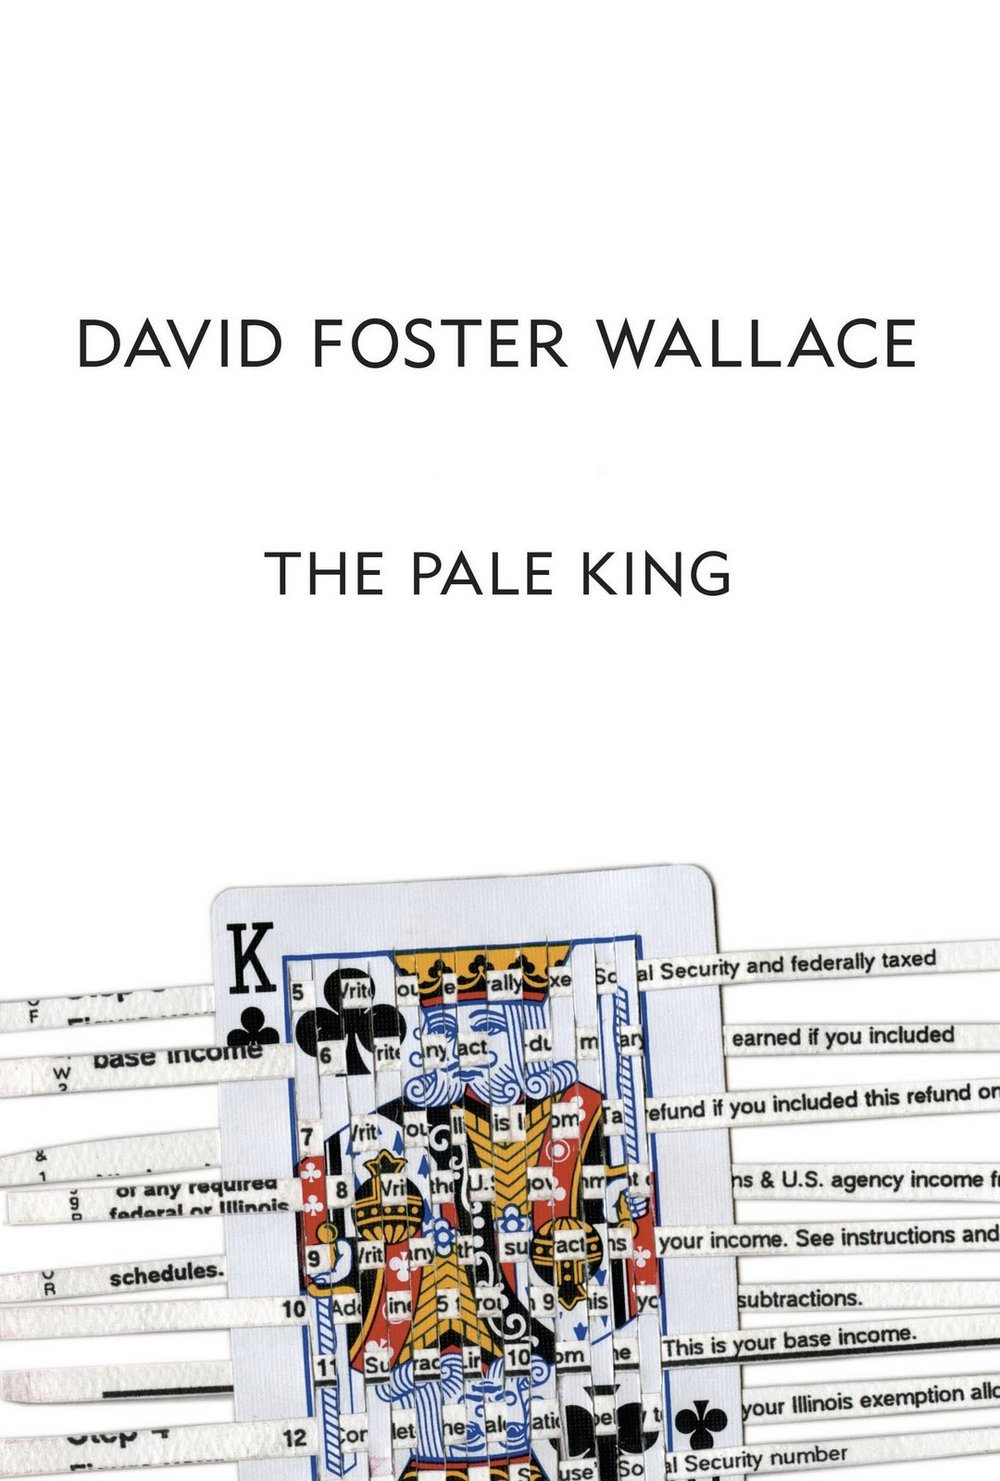 FOSTER_WALLACE_2011_Pale_King.jpg